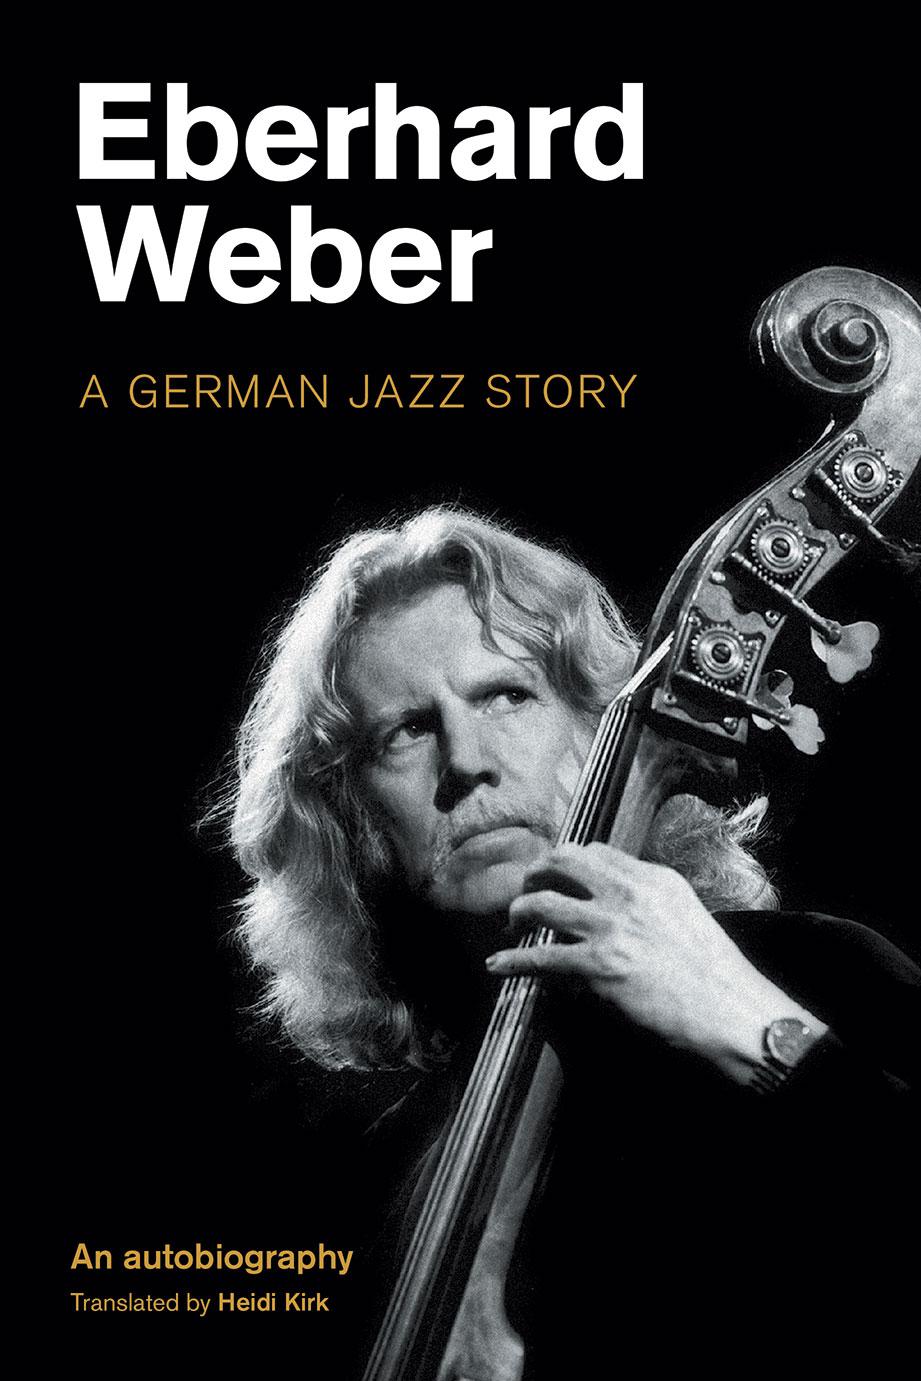 Eberhard Weber - A German Jazz Story - Eberhard Weber